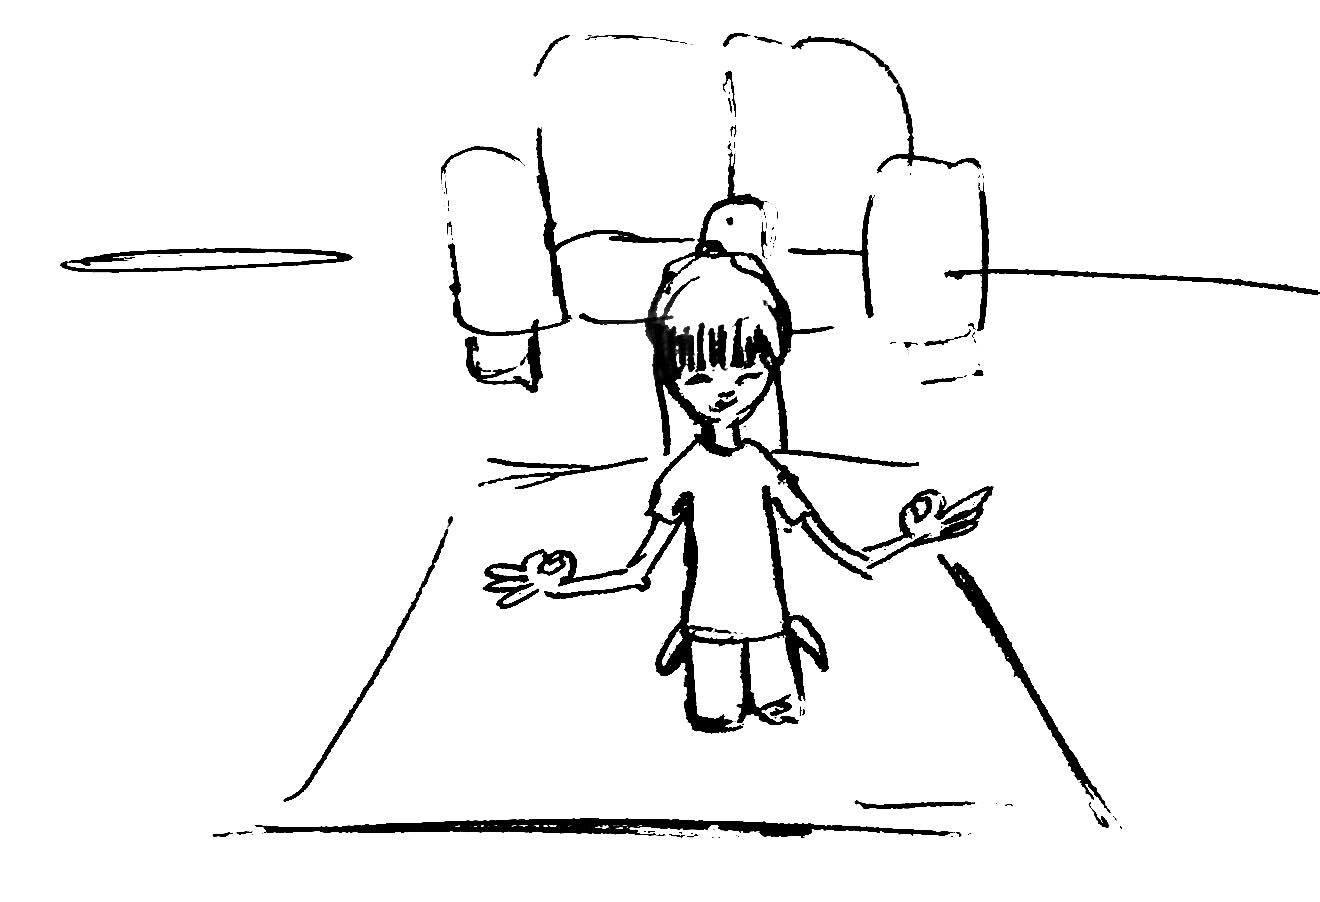 Persona Sketch II